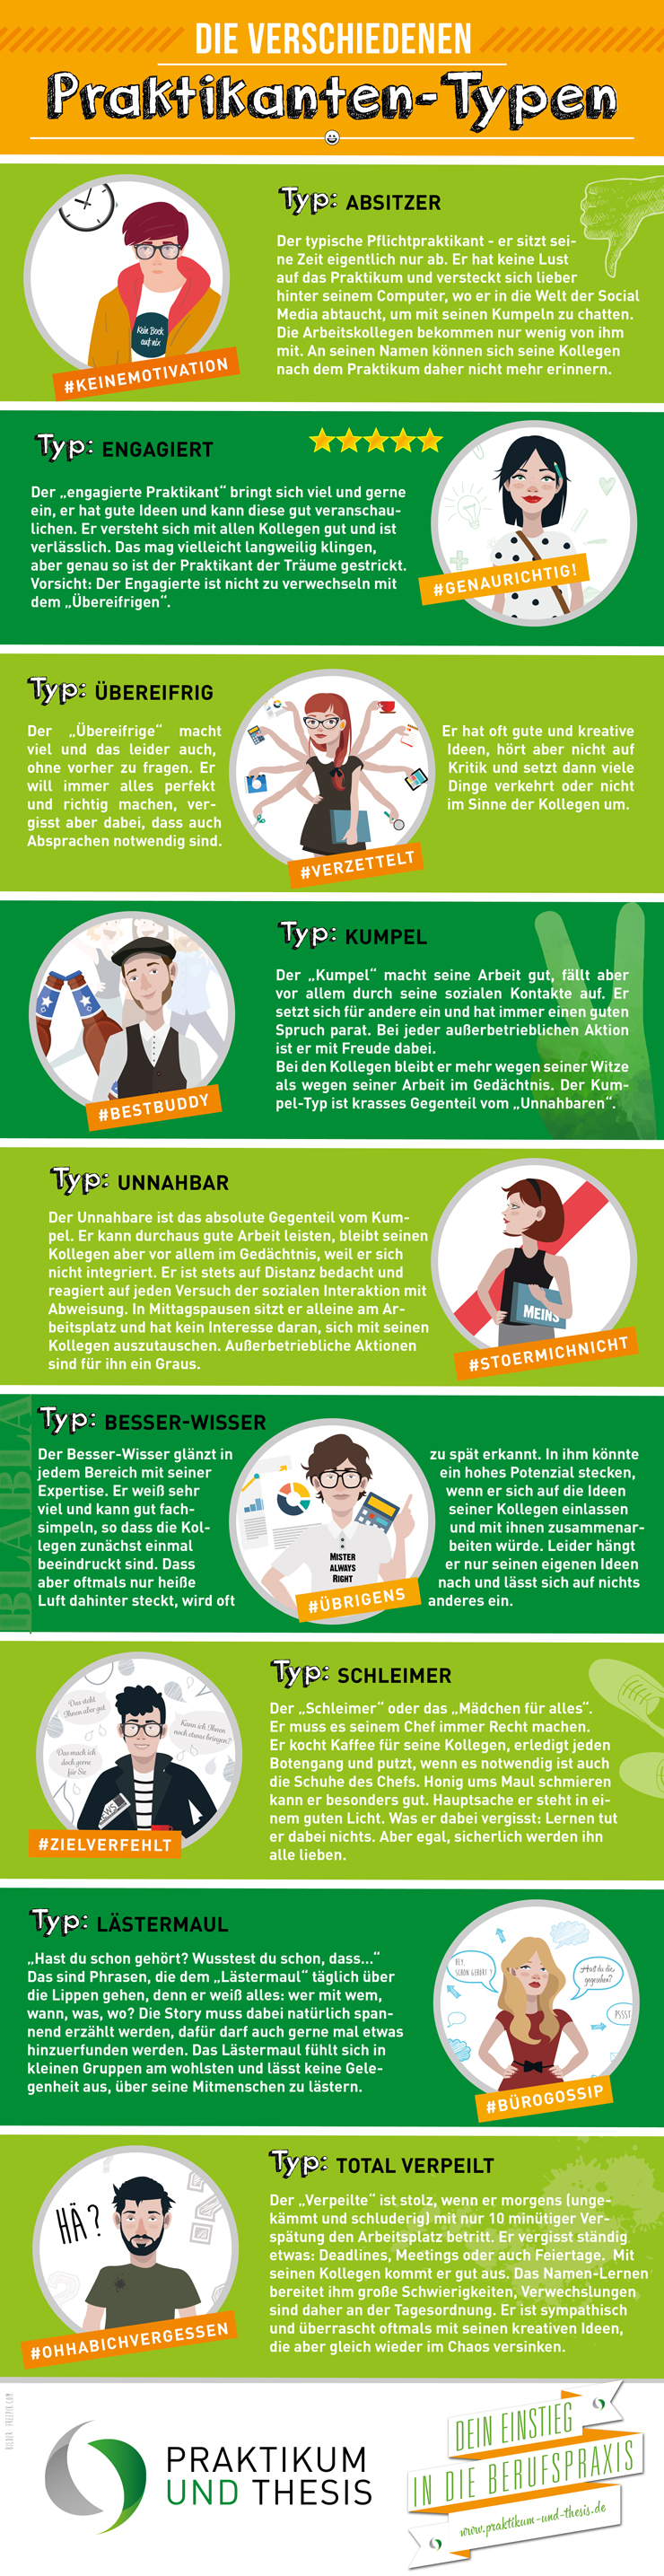 Infografik die verschiedenen praktikanten typen for Praktikum modedesign stuttgart